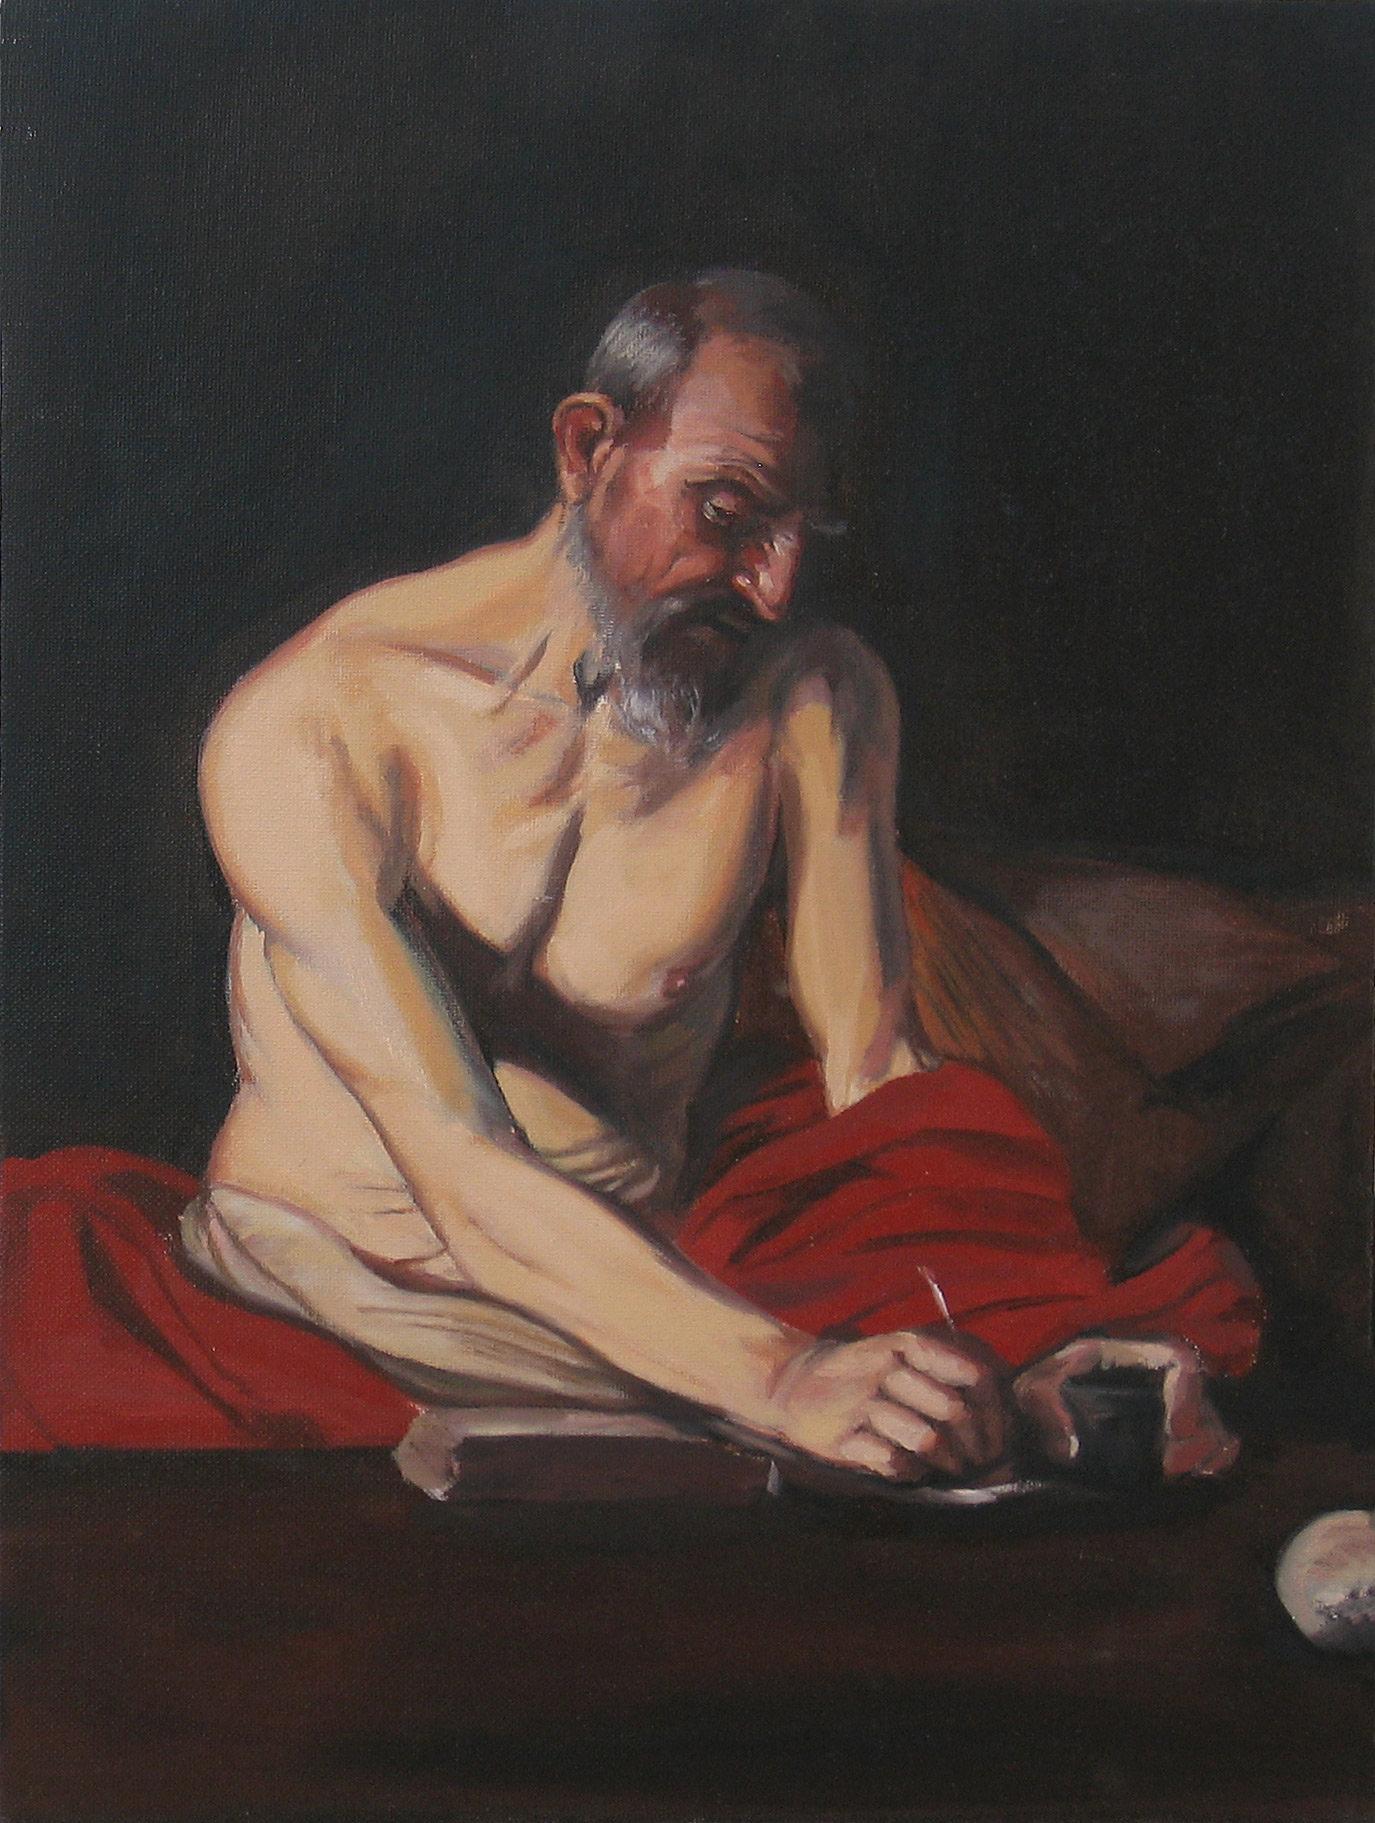 Alex bobylev figurepainting04